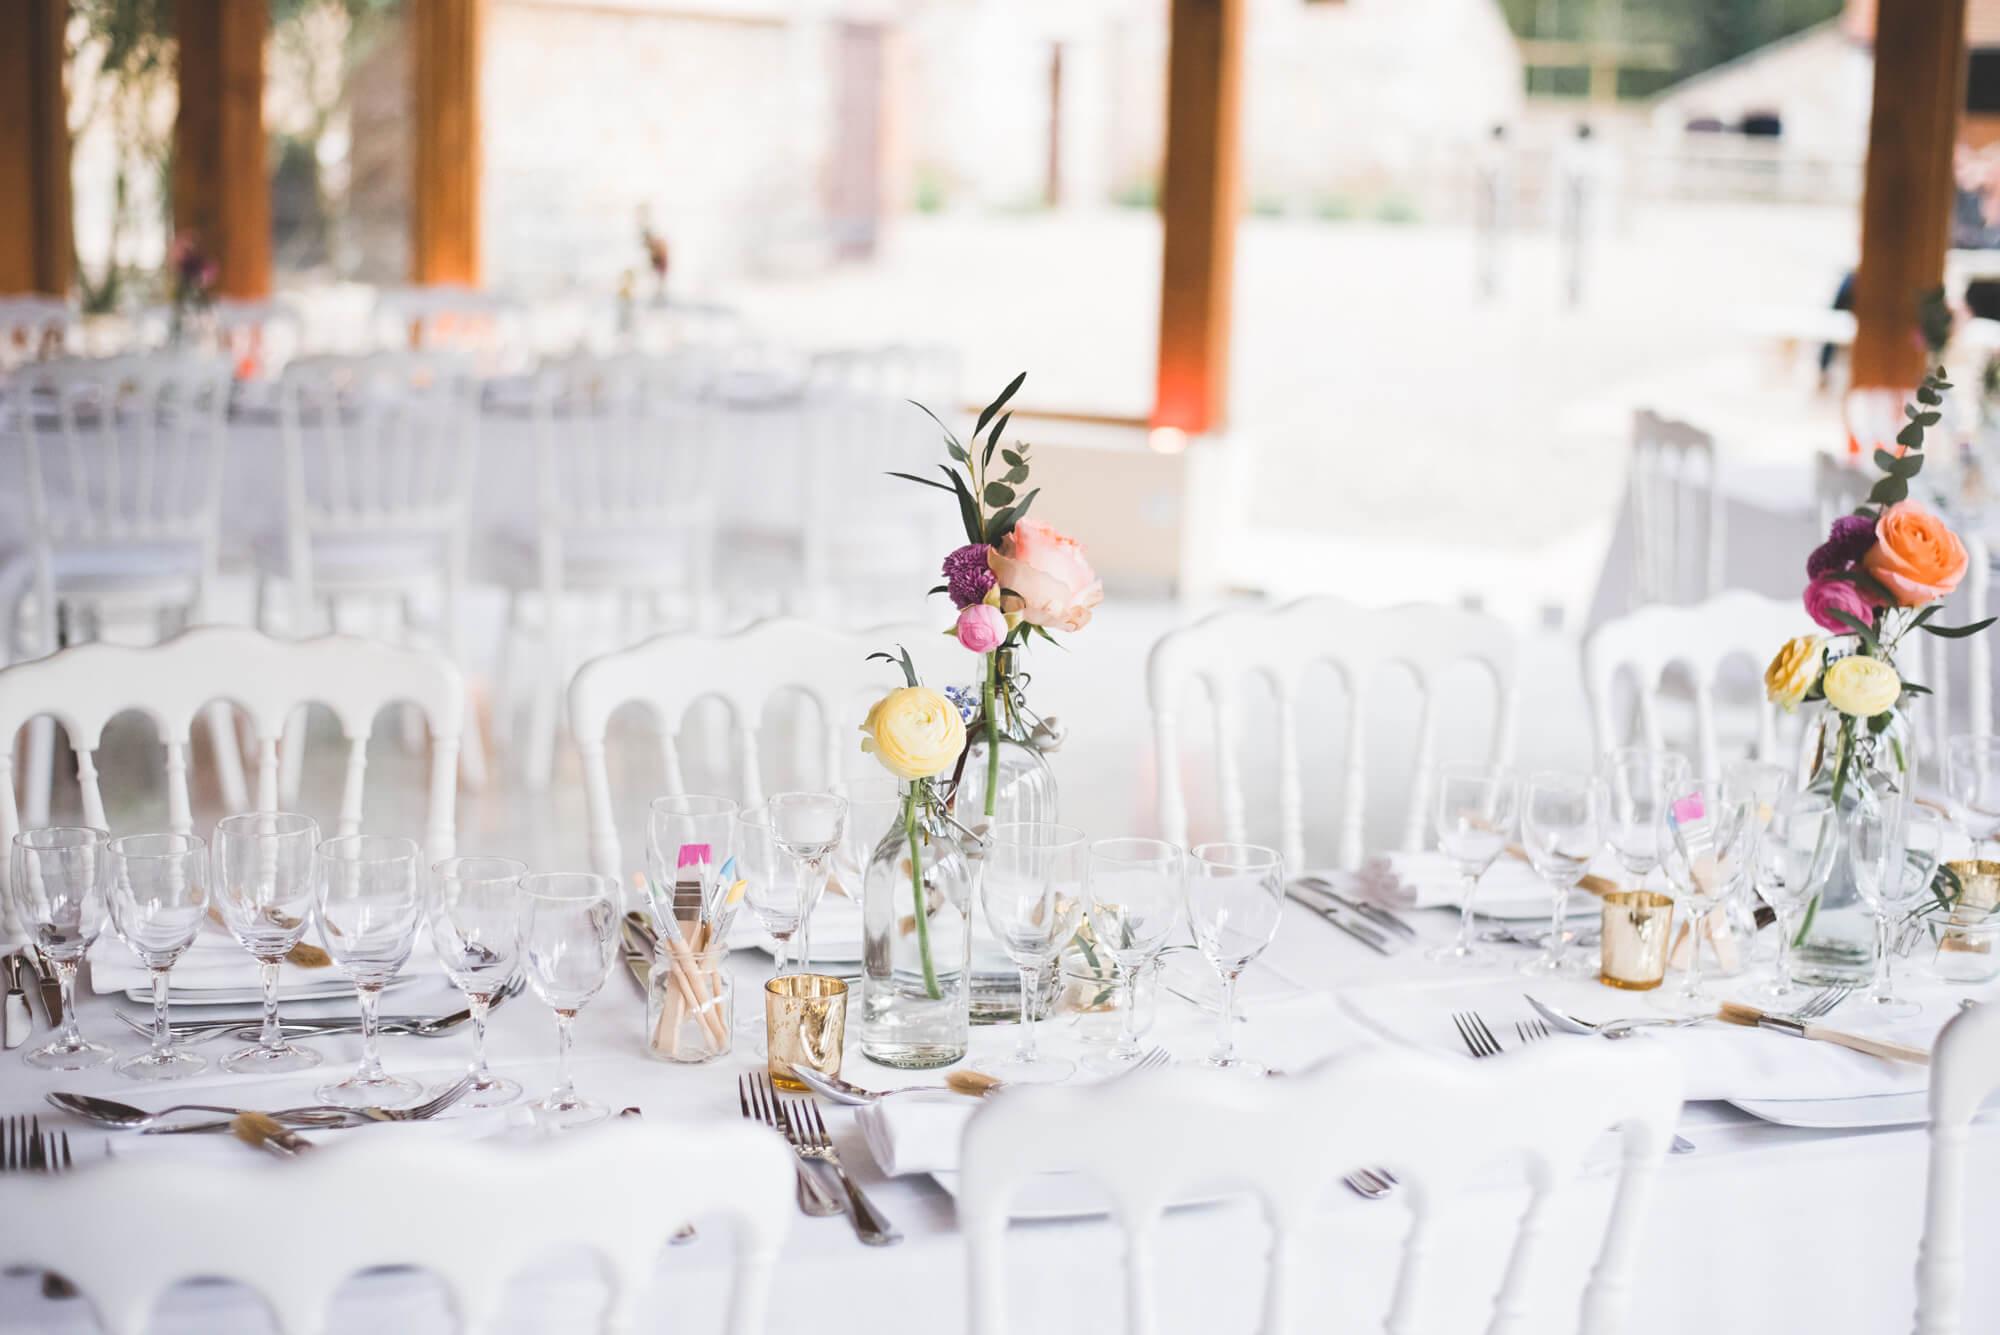 mariage_blanc_pastel_simple_chic